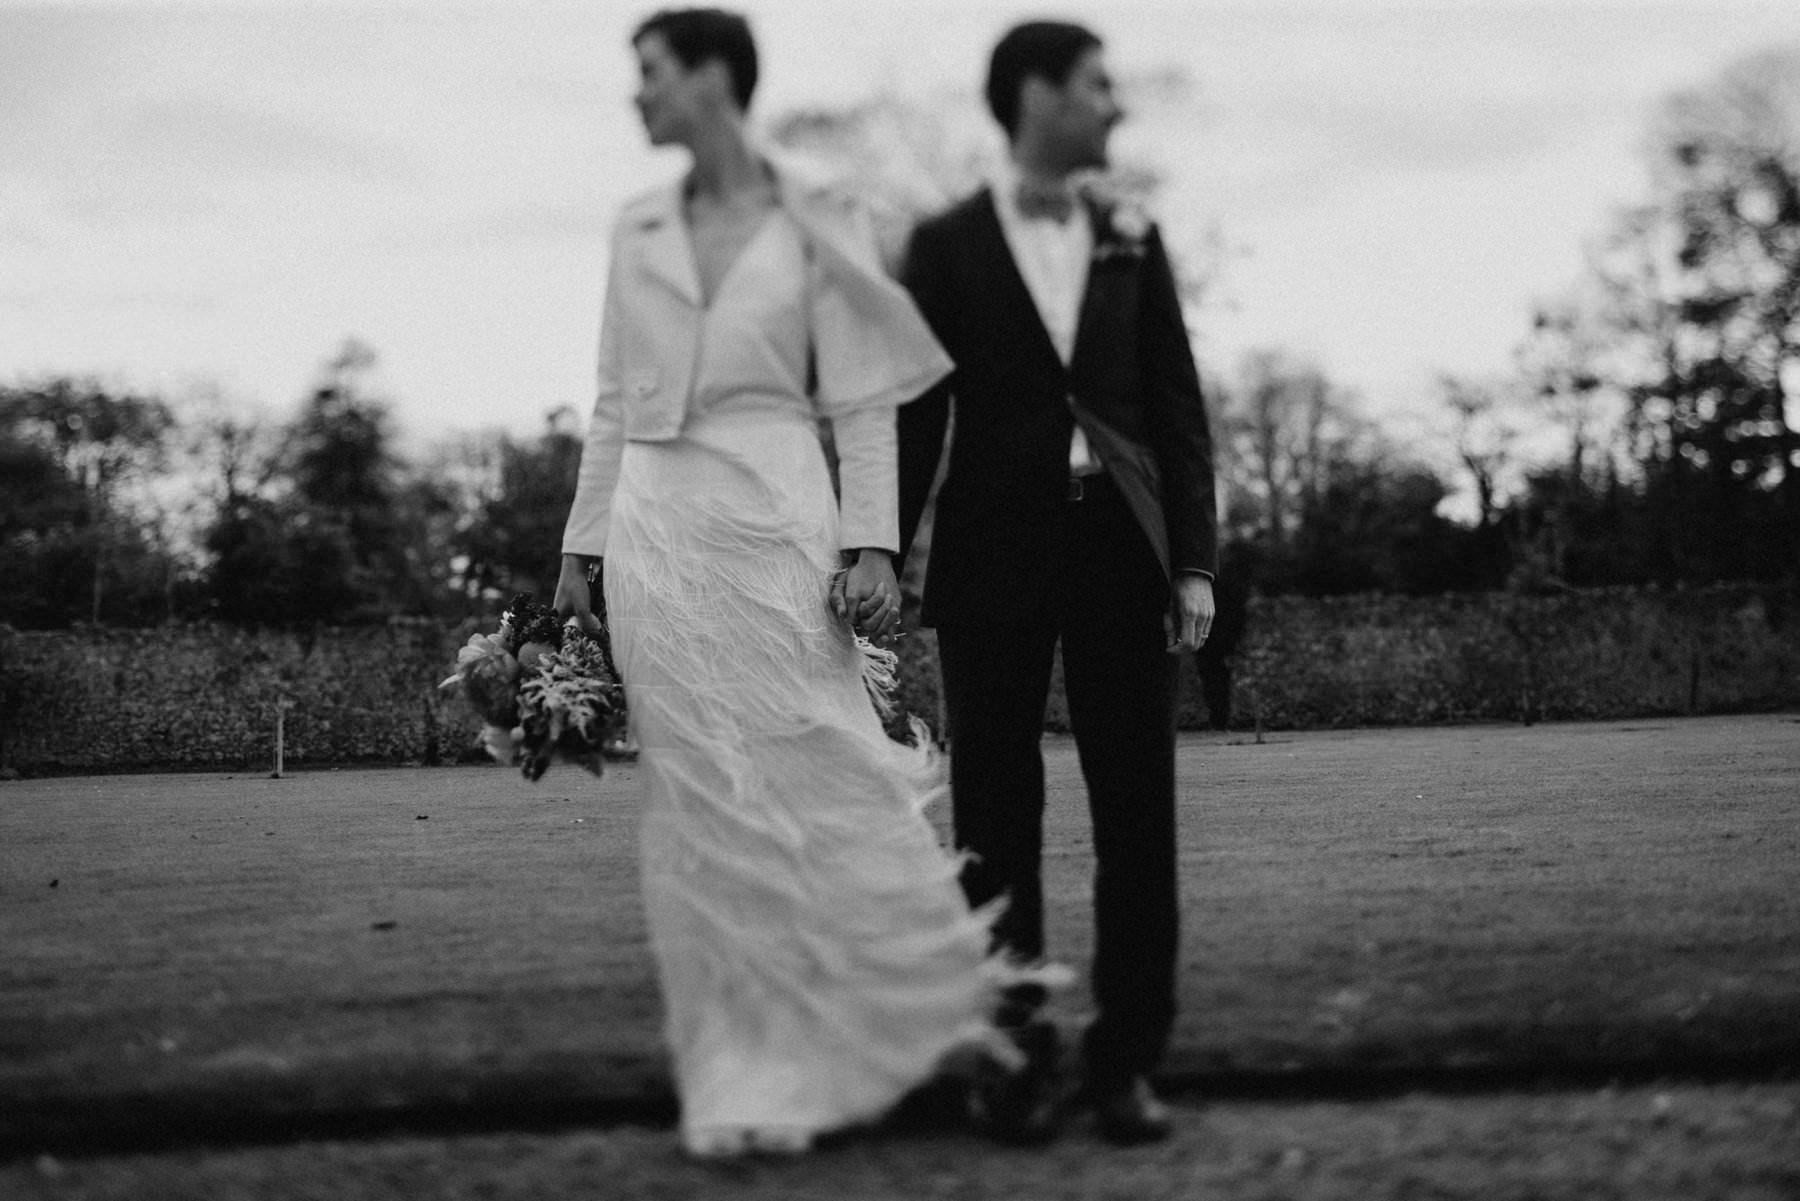 cloughjordan house wedding photography